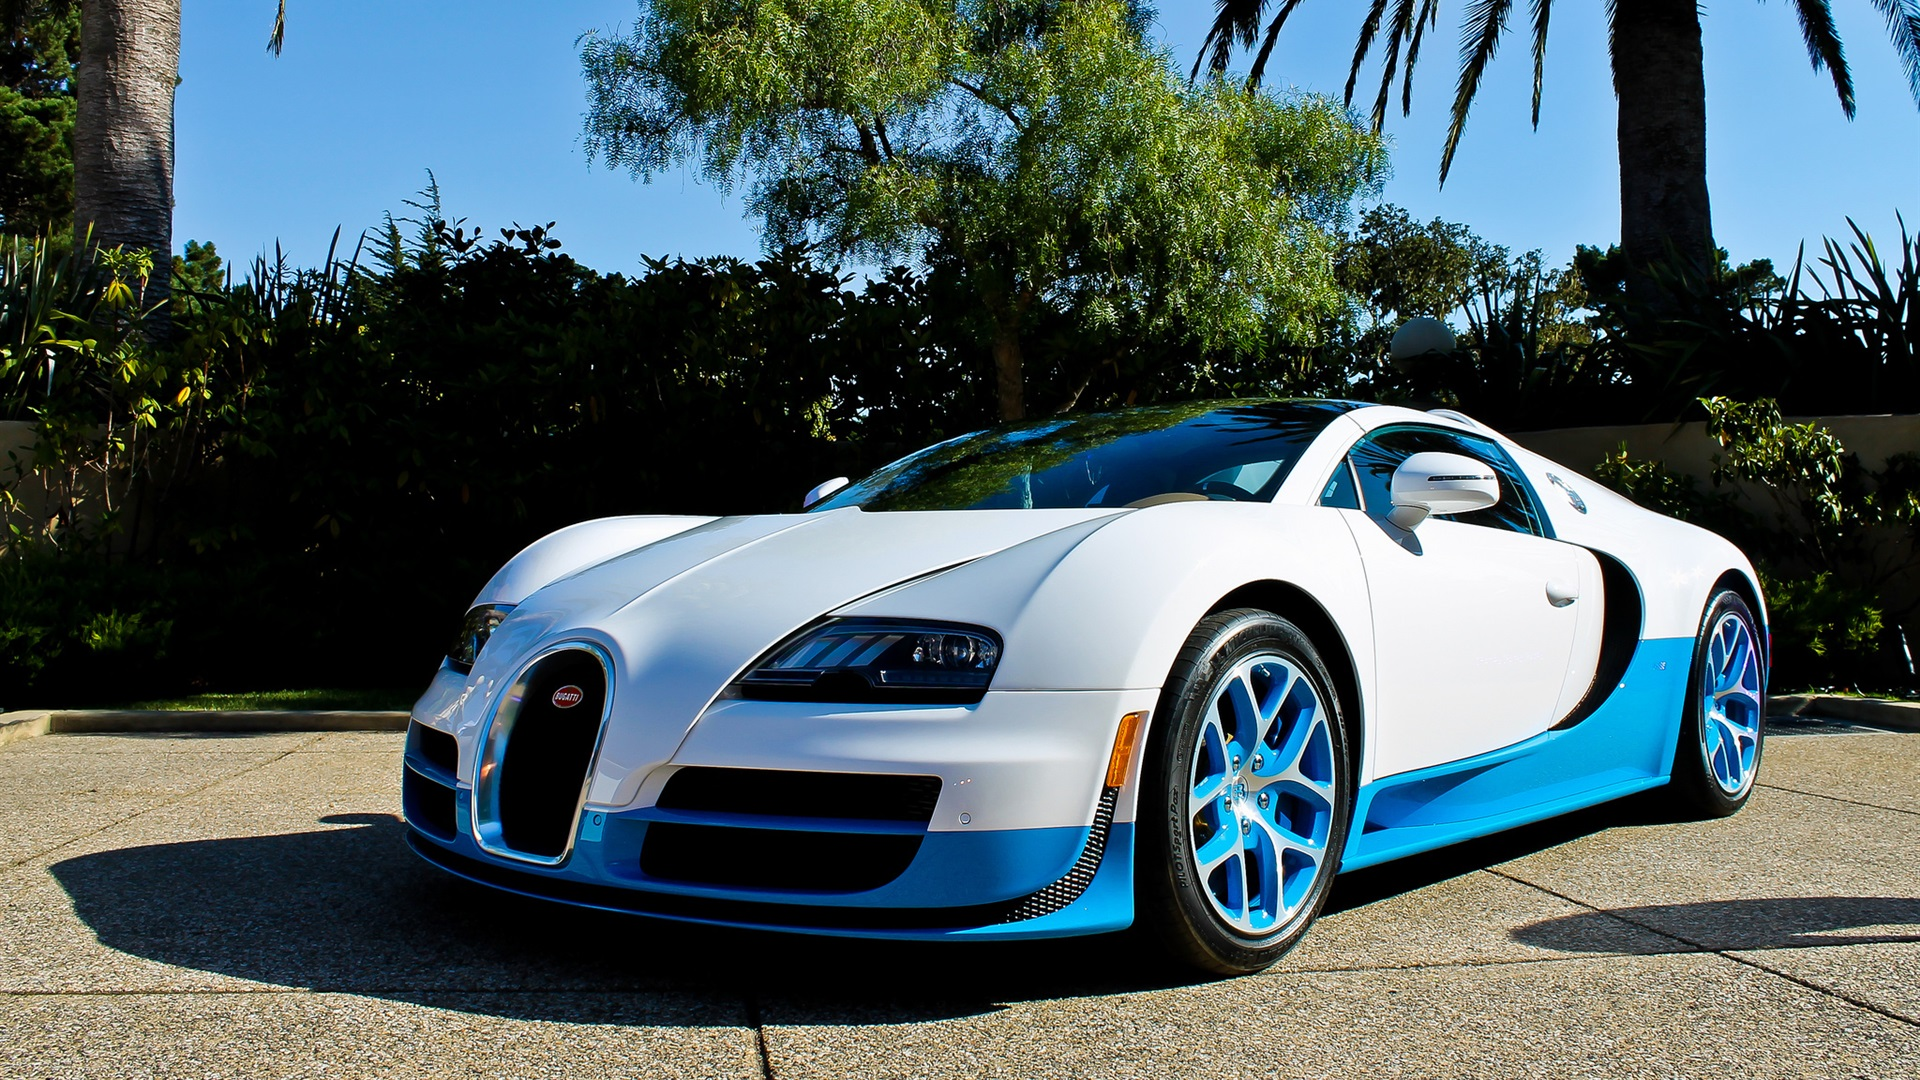 Wallpaper Bugatti Veyron Supercar White And Blue Palm